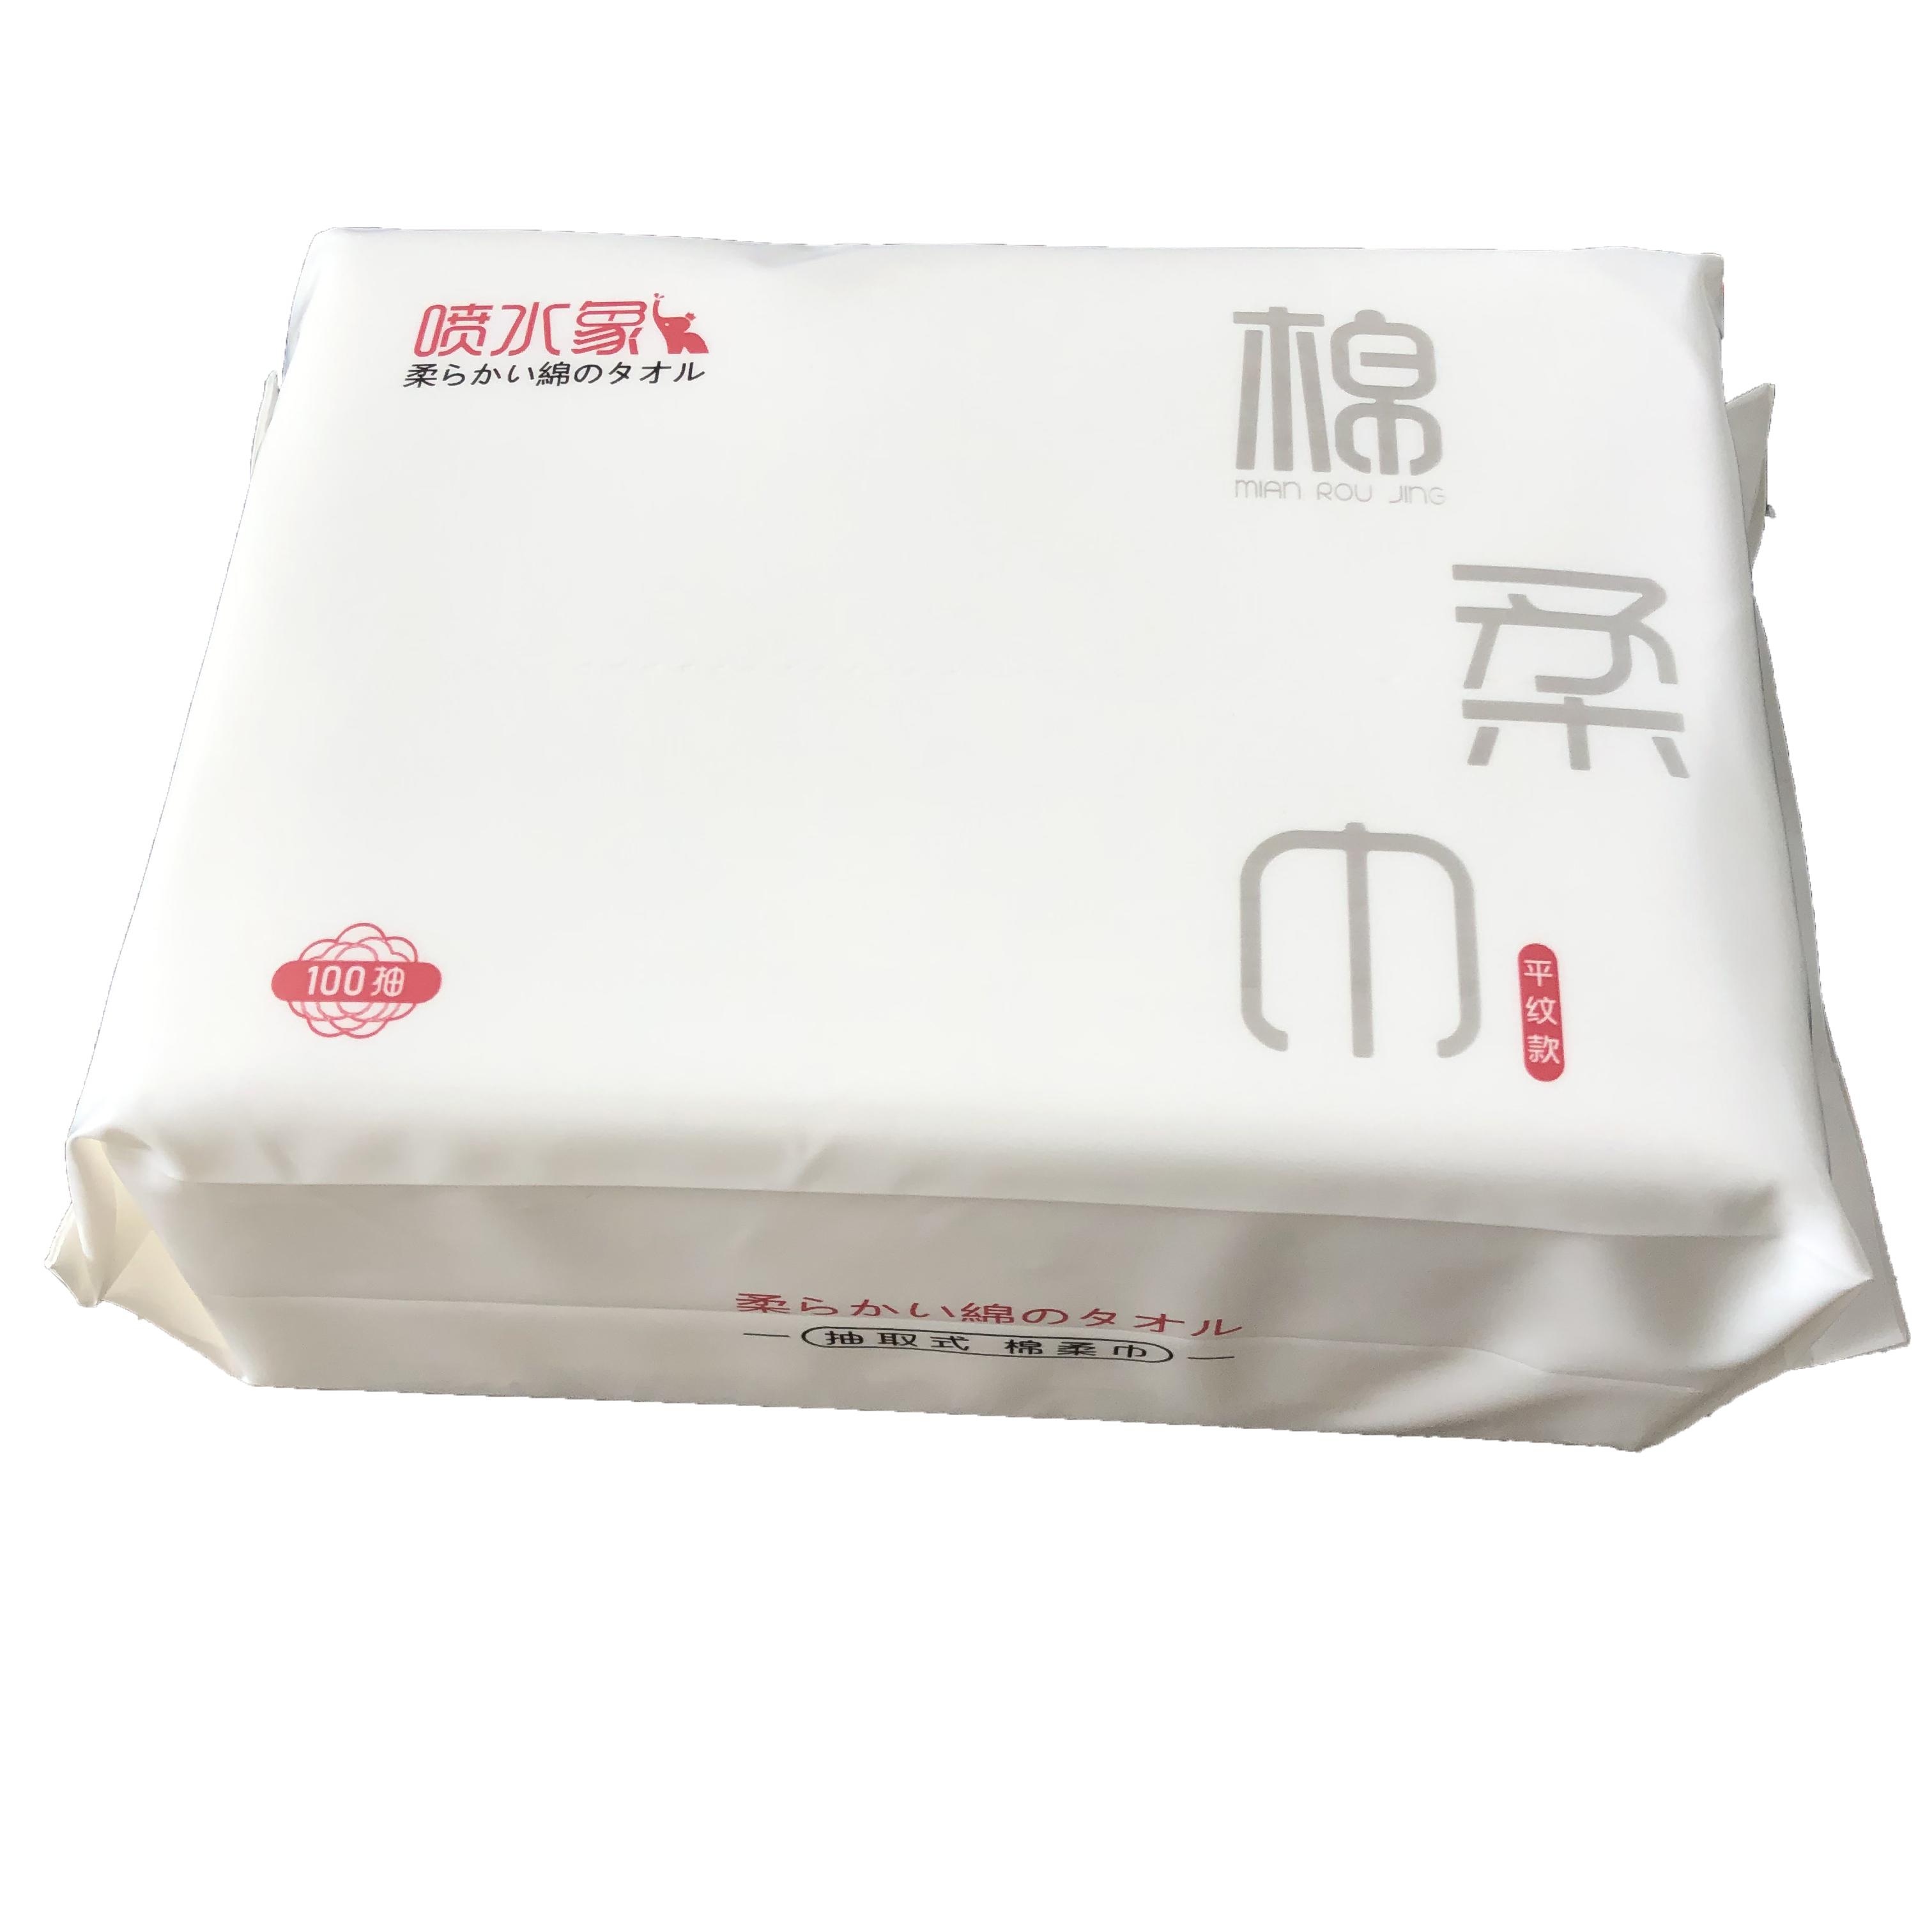 Plain weave 14*20cm multifunctional facial towel hand towels tea towel